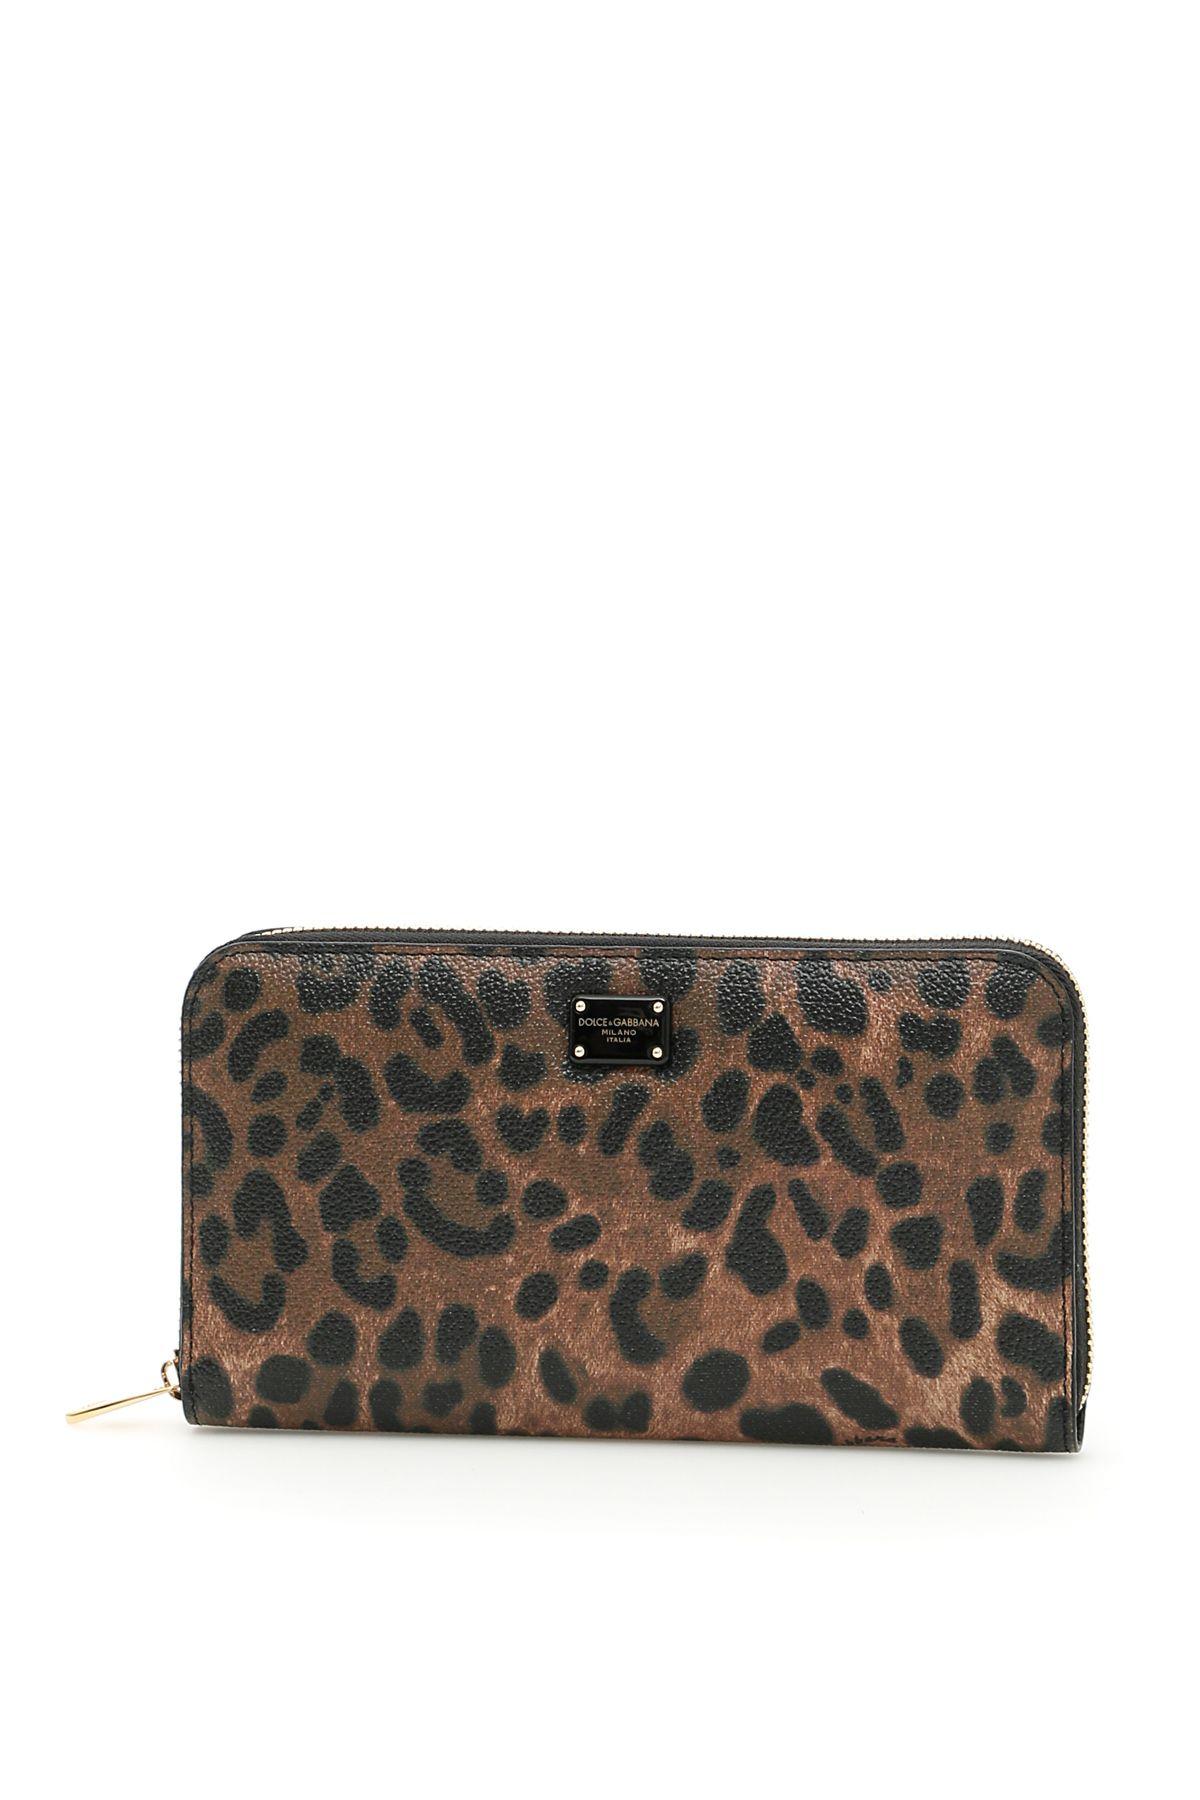 Textured Leopard Print Zip-around Wallet